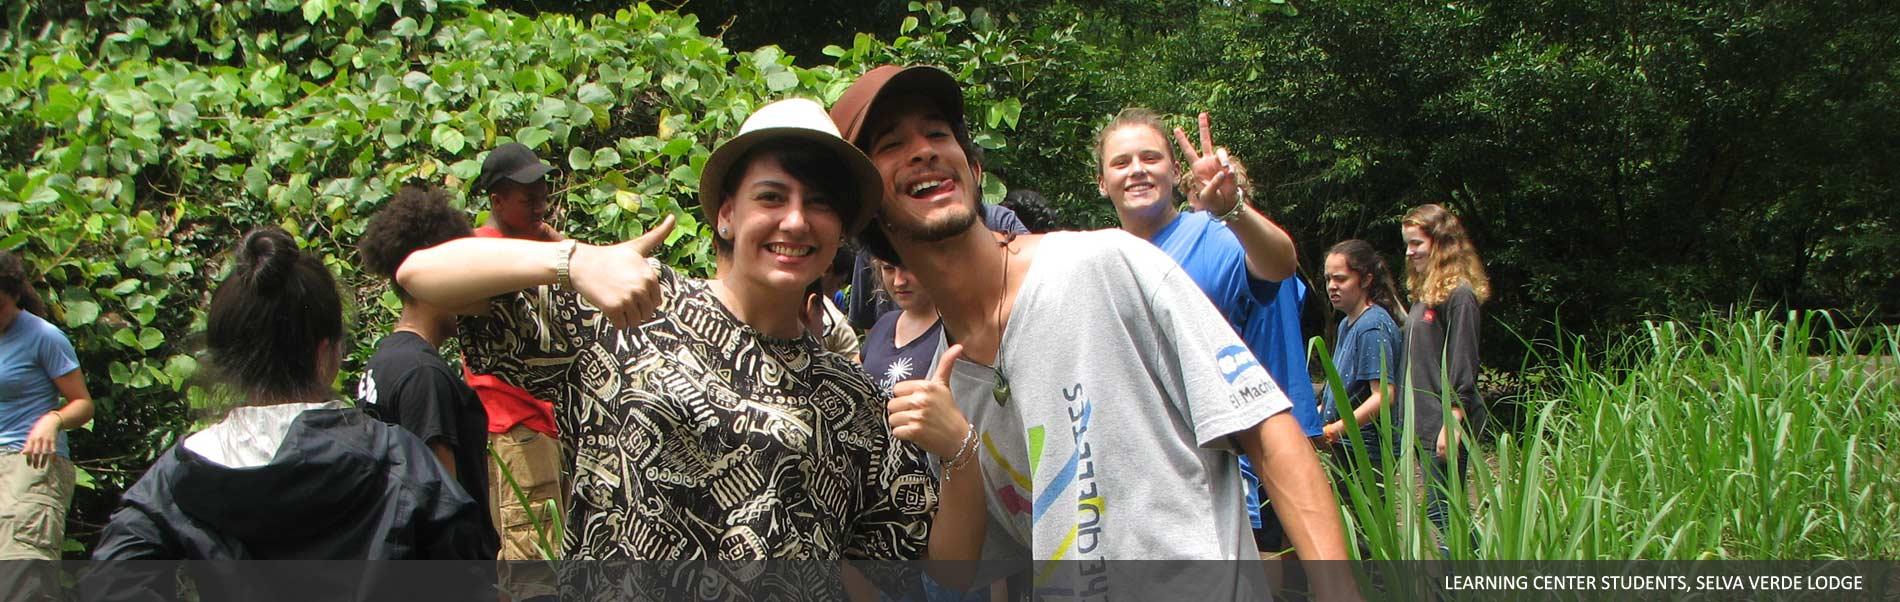 selvaverde-costarica-23.jpg